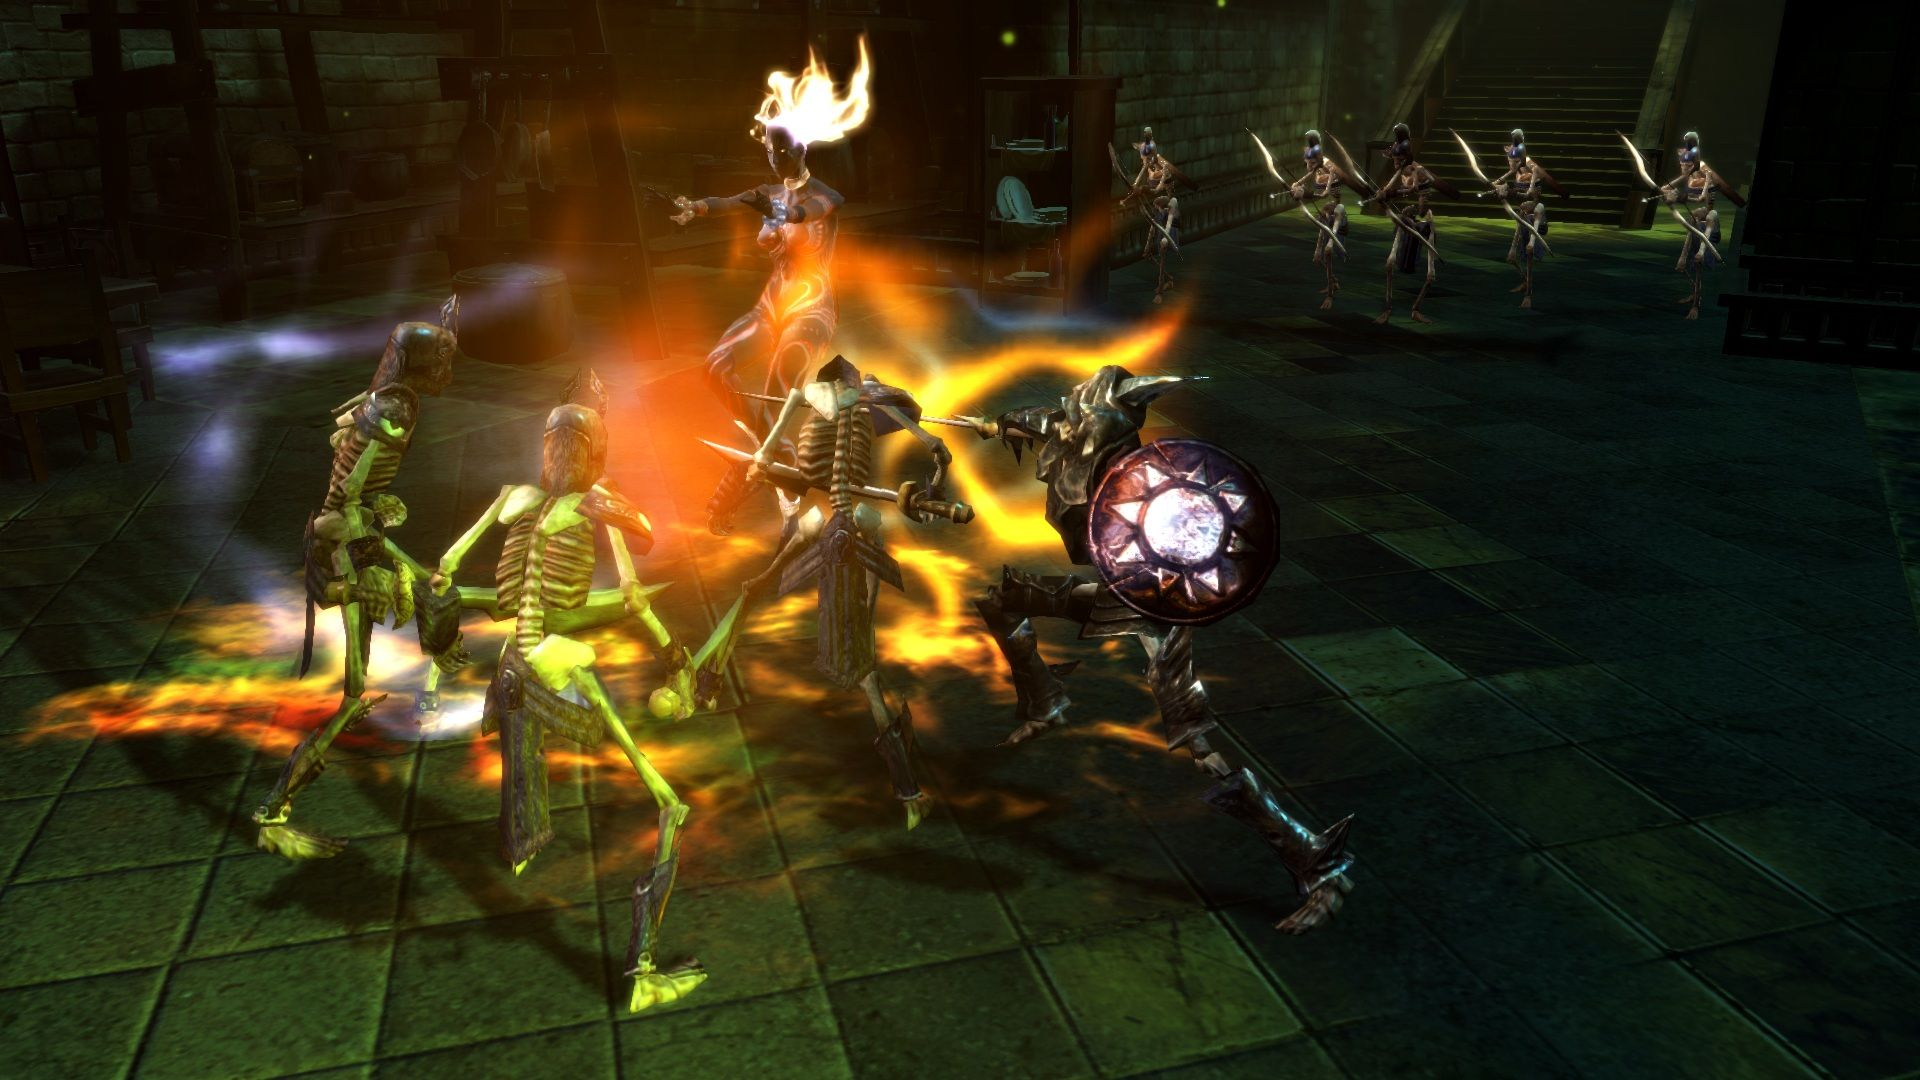 dungeon siege 3 free download pc